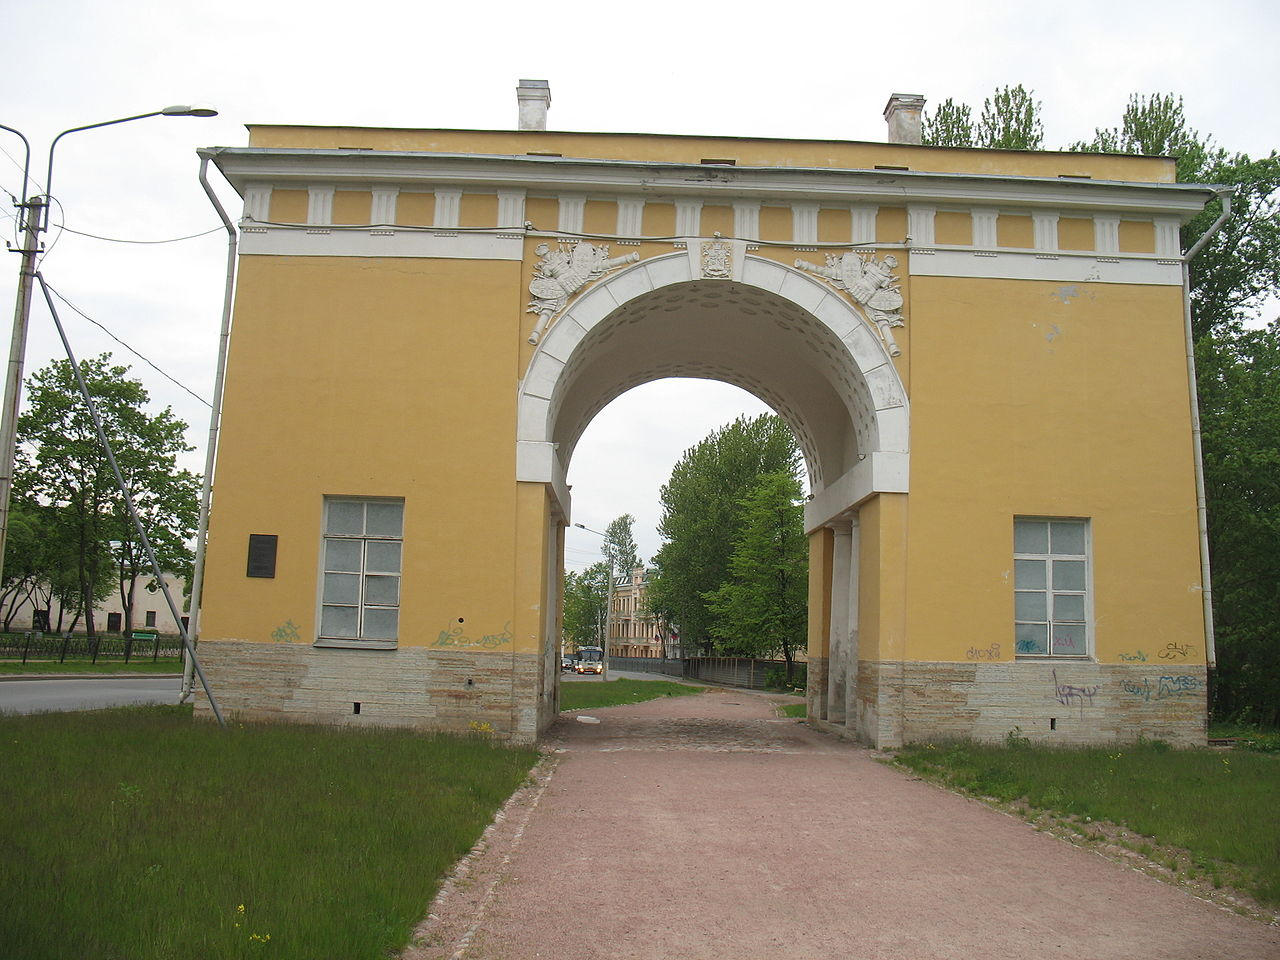 Городские ворота. Автор фото: User:Stassats (Wikimedia Commons)